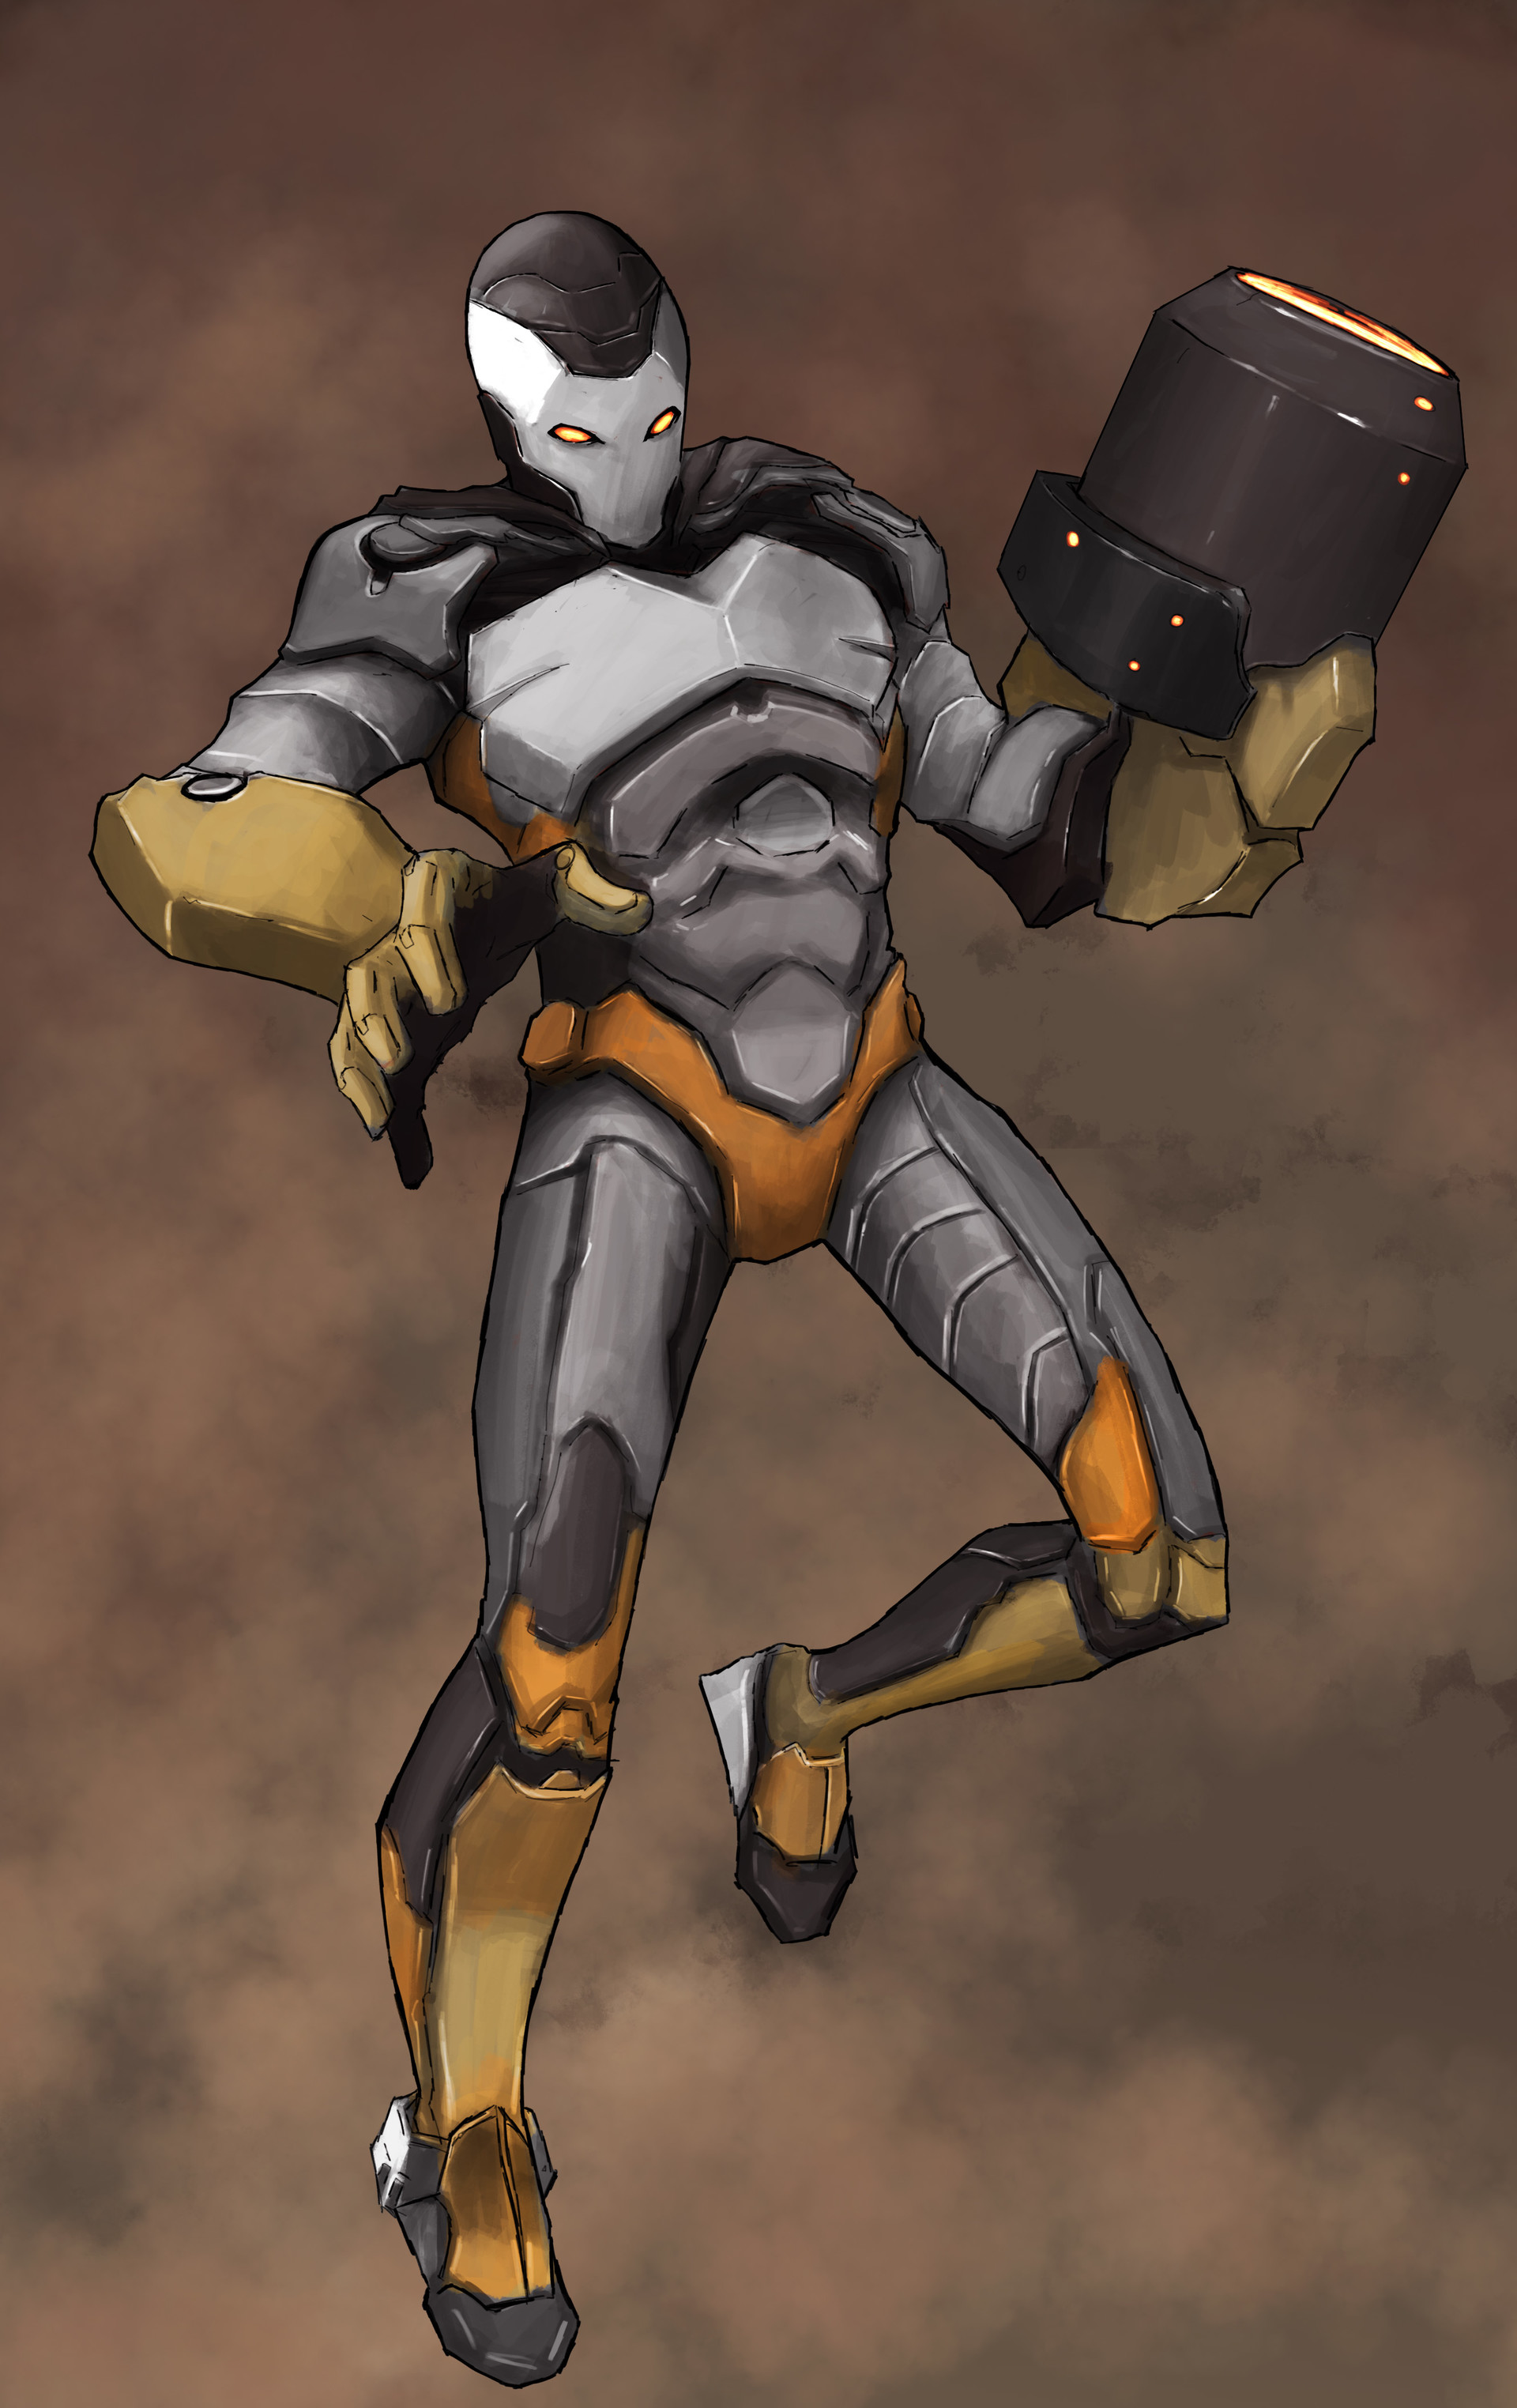 Gbenle maverick cyborg 10